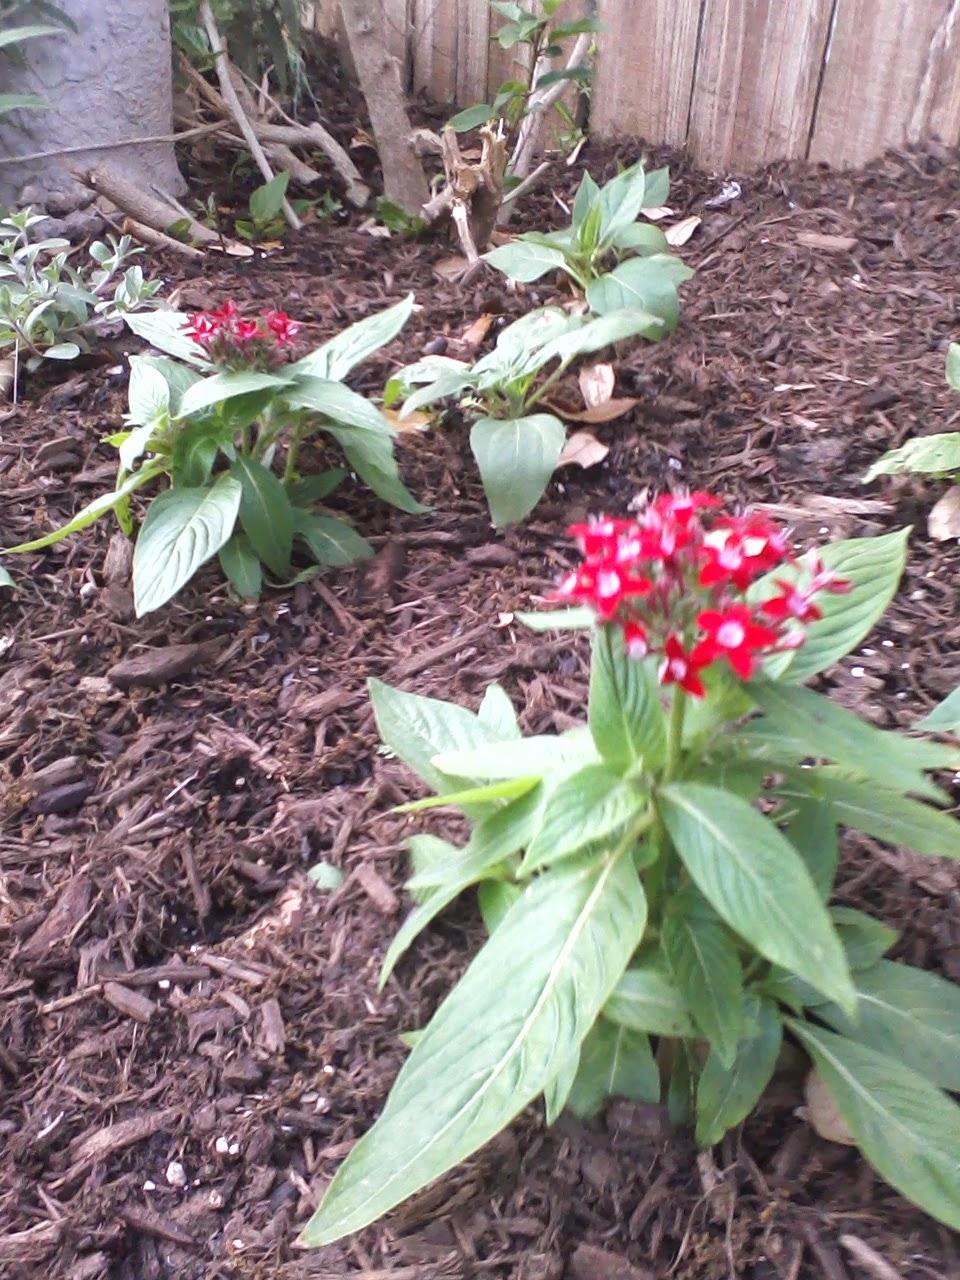 Gardening 2014 - 0404190455.jpg